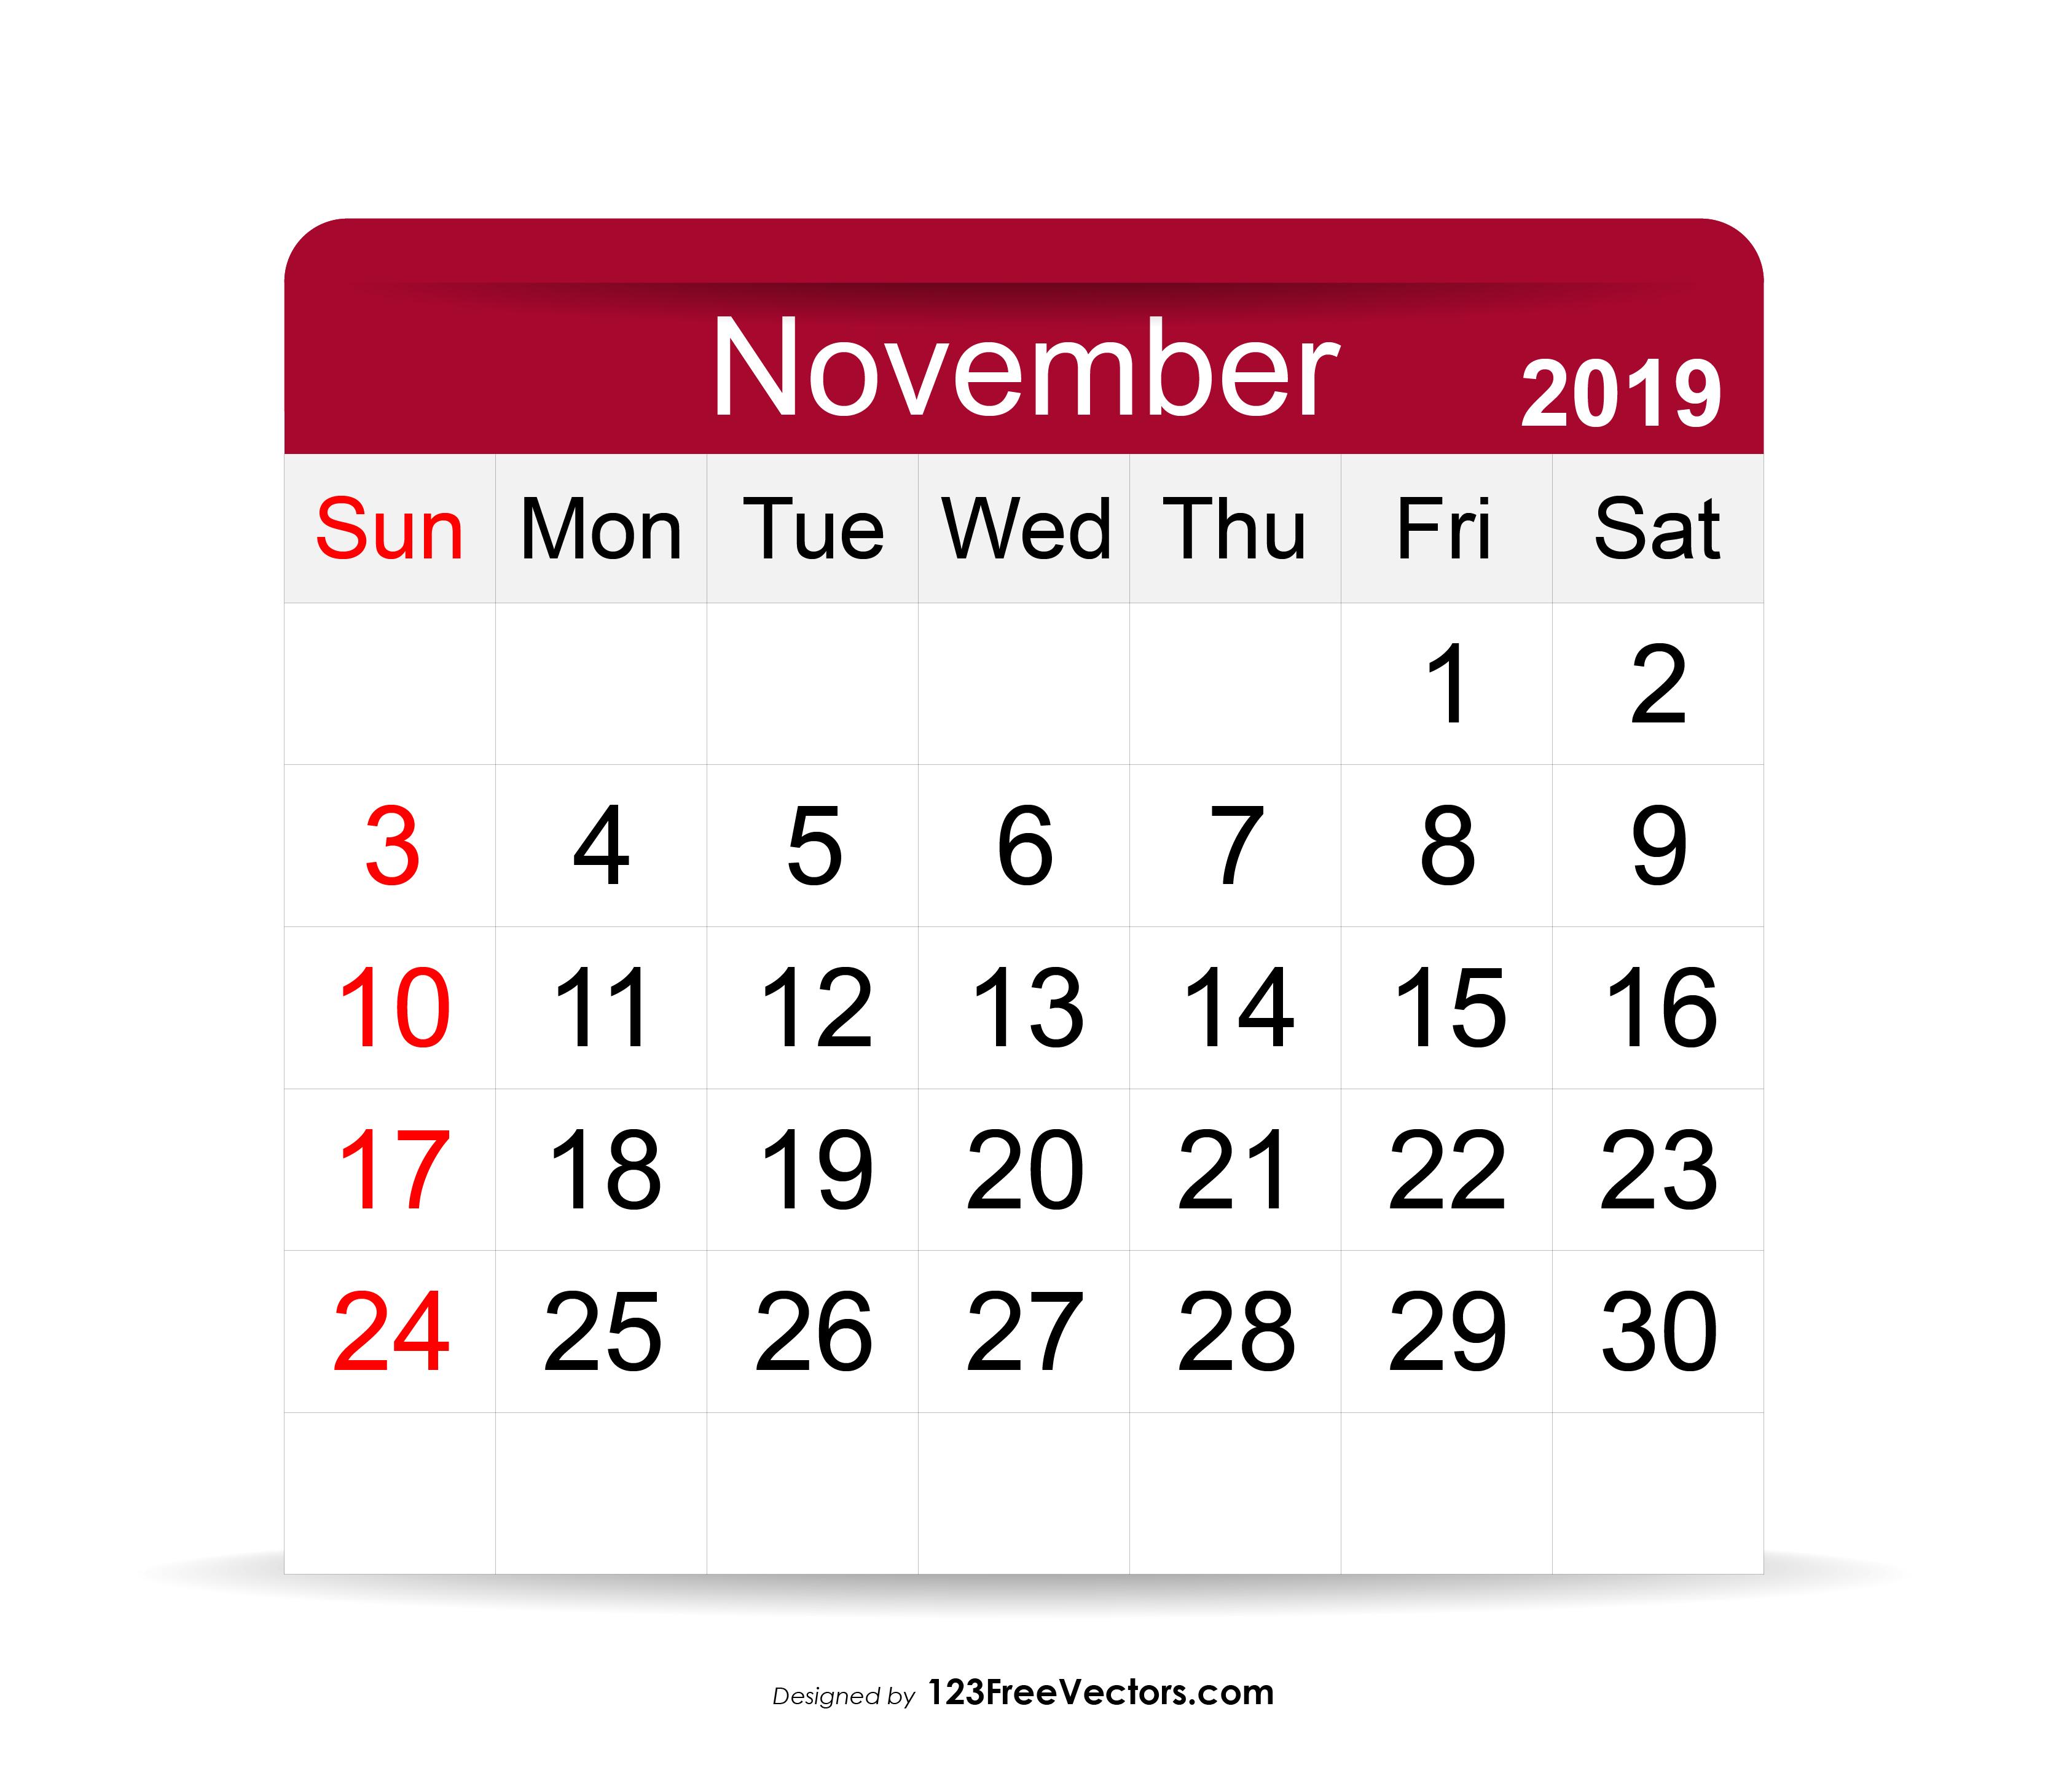 November 2019 Calendar Clipart  Yatay.horizonconsulting.co in November Calendar Clipart Free